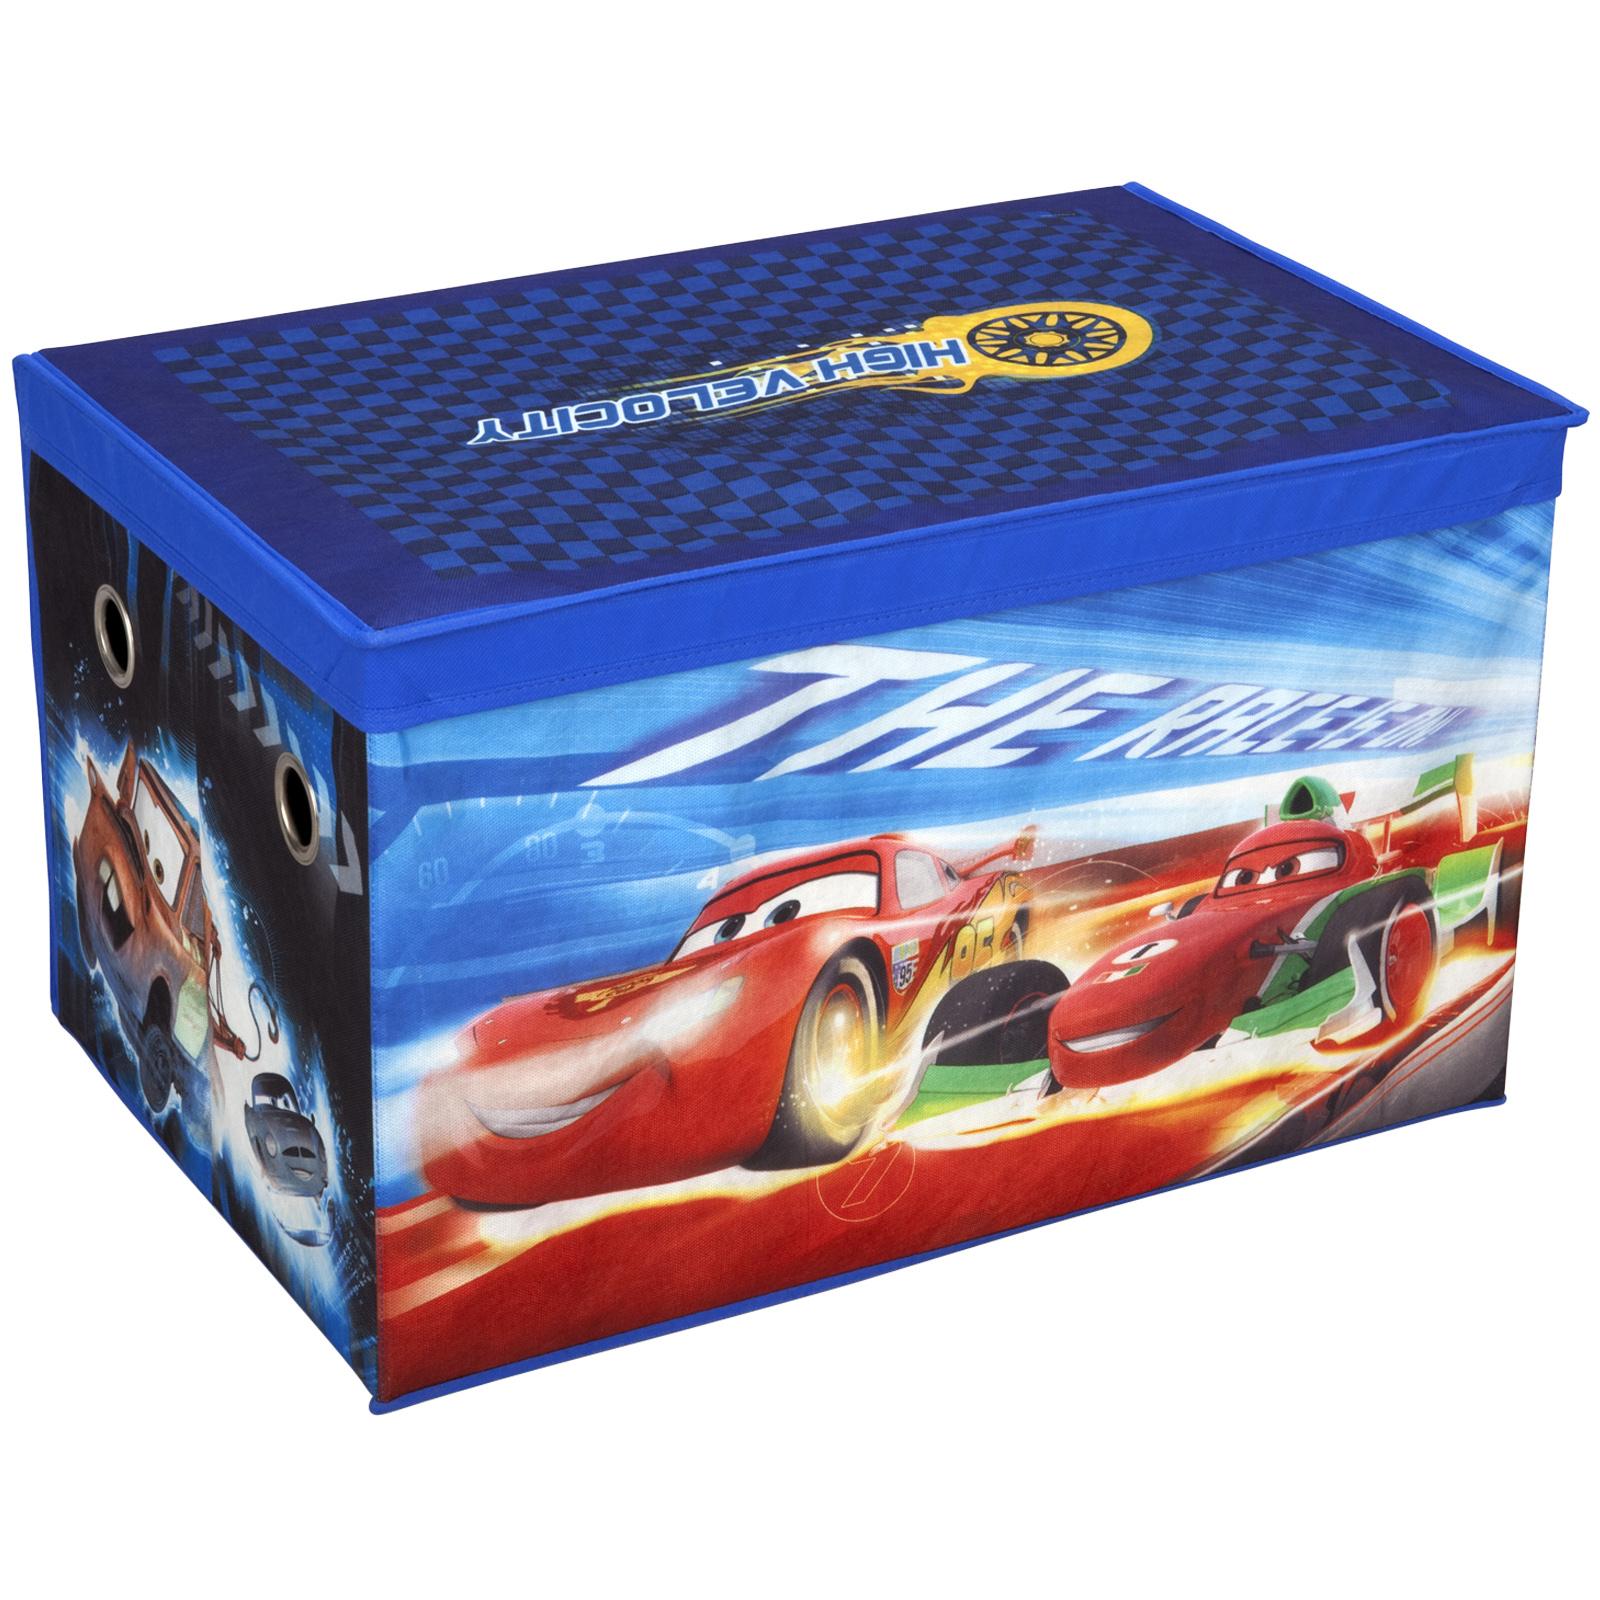 Disney kinder truhe kiste box spielzeugtruhe spielzeugbox